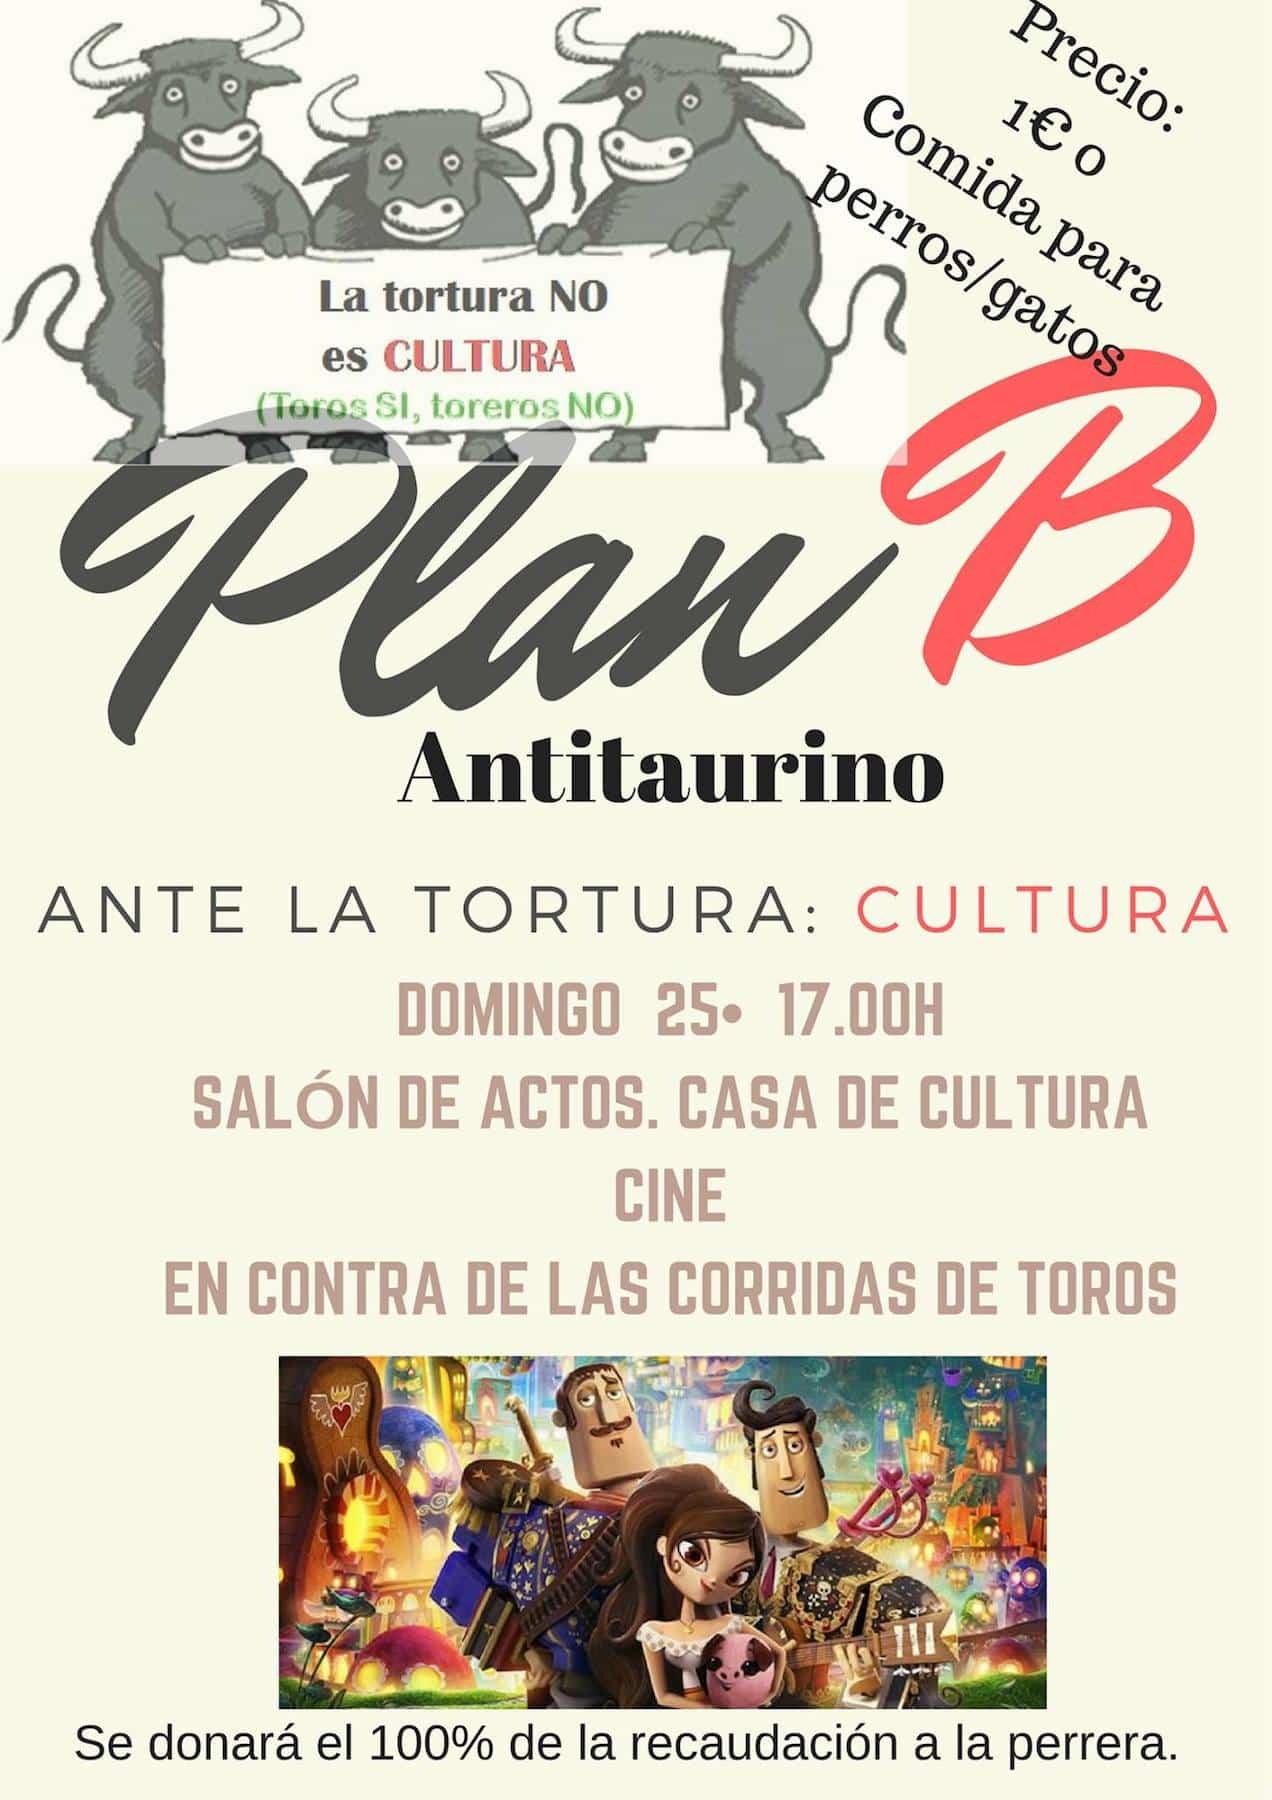 plan b antitaurino feria herencia 2018 - Este año de momento sin Plan B Antitaurino para la Feria y Fiestas en Herencia